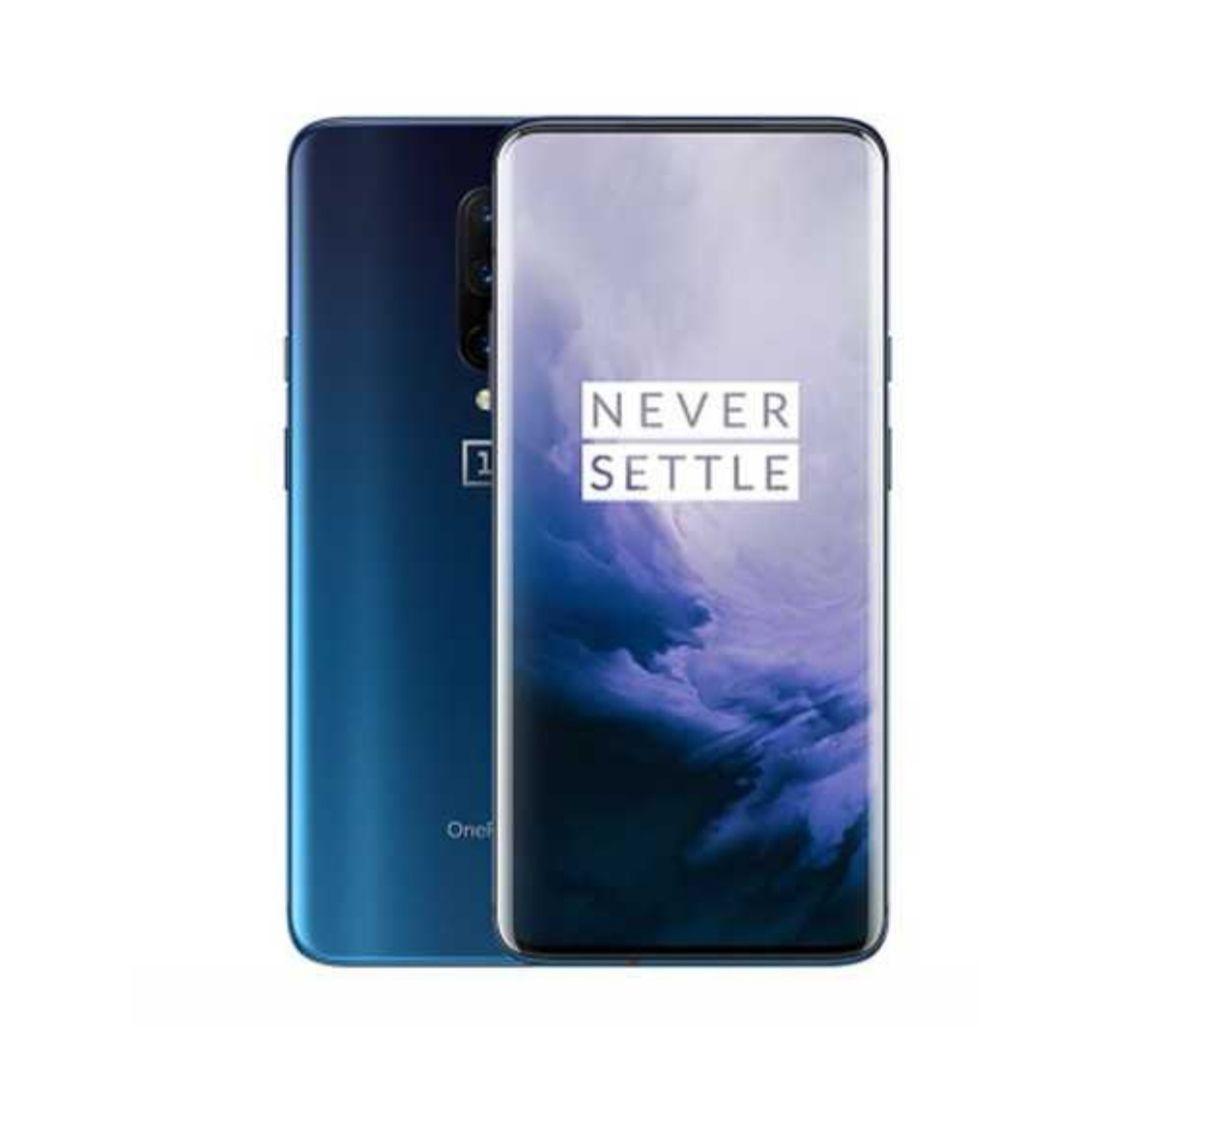 OnePlus 7 Pro - 12GB/256GB - Snapdragon 855 - 48 MP